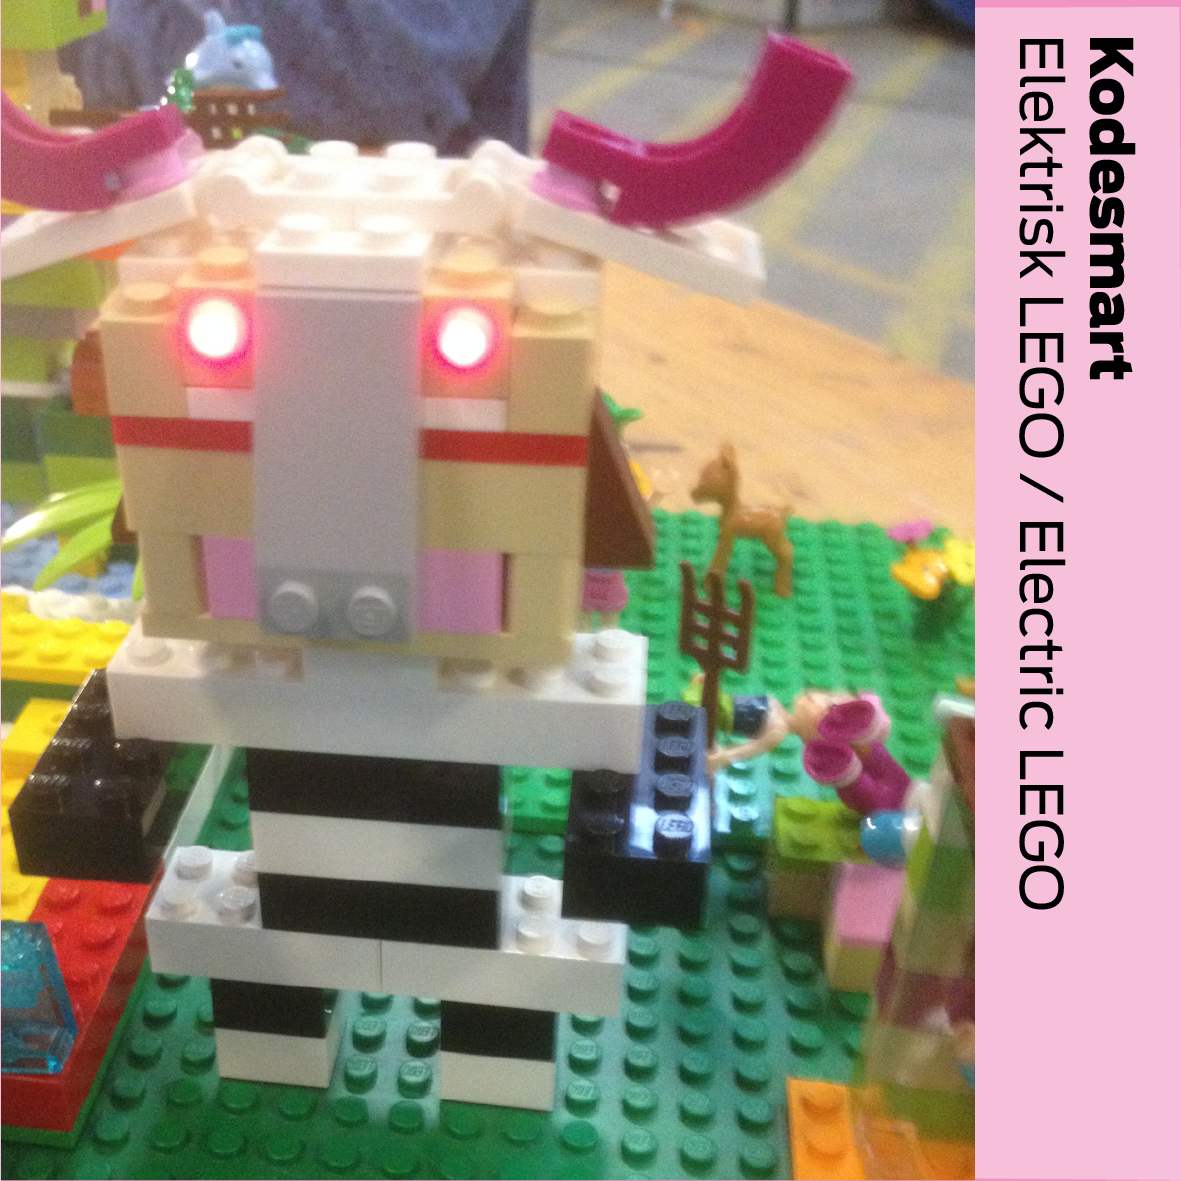 Kodesmart (DK): Elektrisk LEGO / Electric LEGO